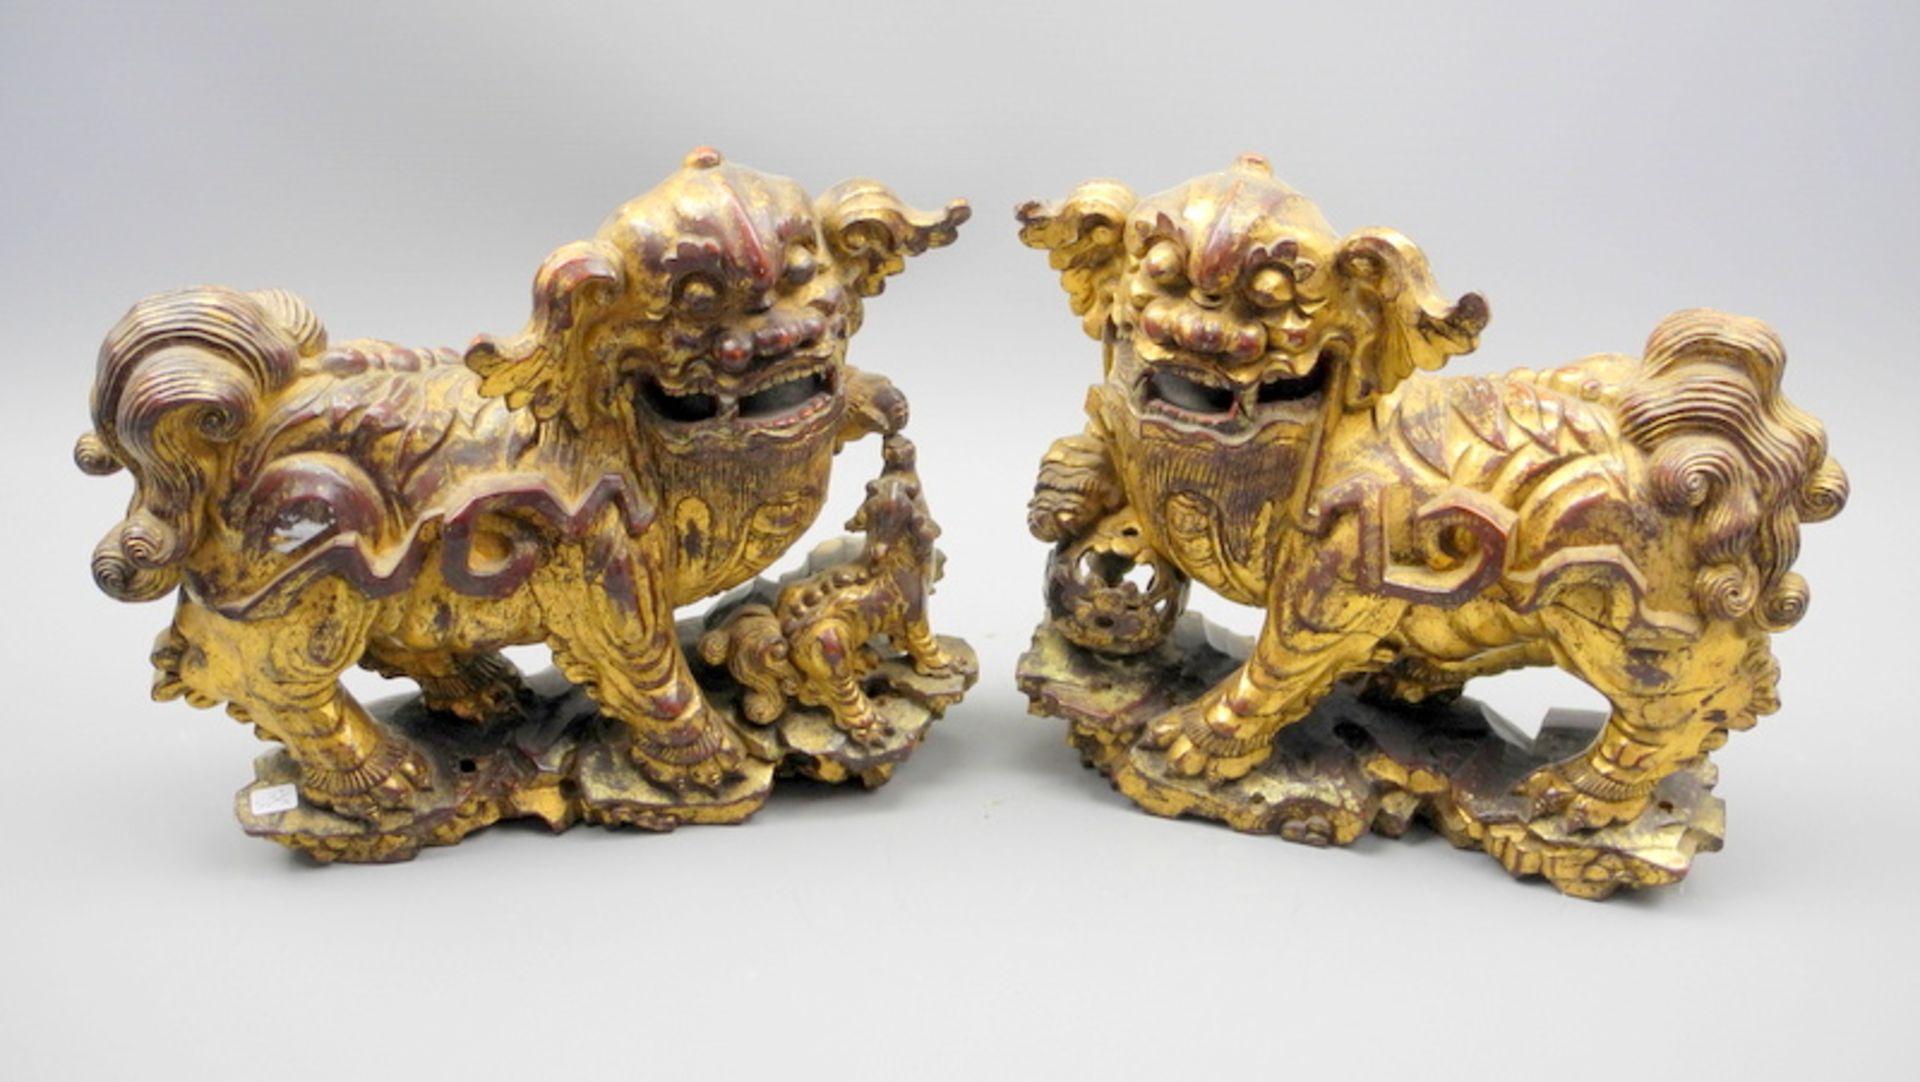 Hochwertiges Paar Fo-HundeHolz geschnitzt, vergoldet. Zwei Fo-Hunde als Gegenpaar in f